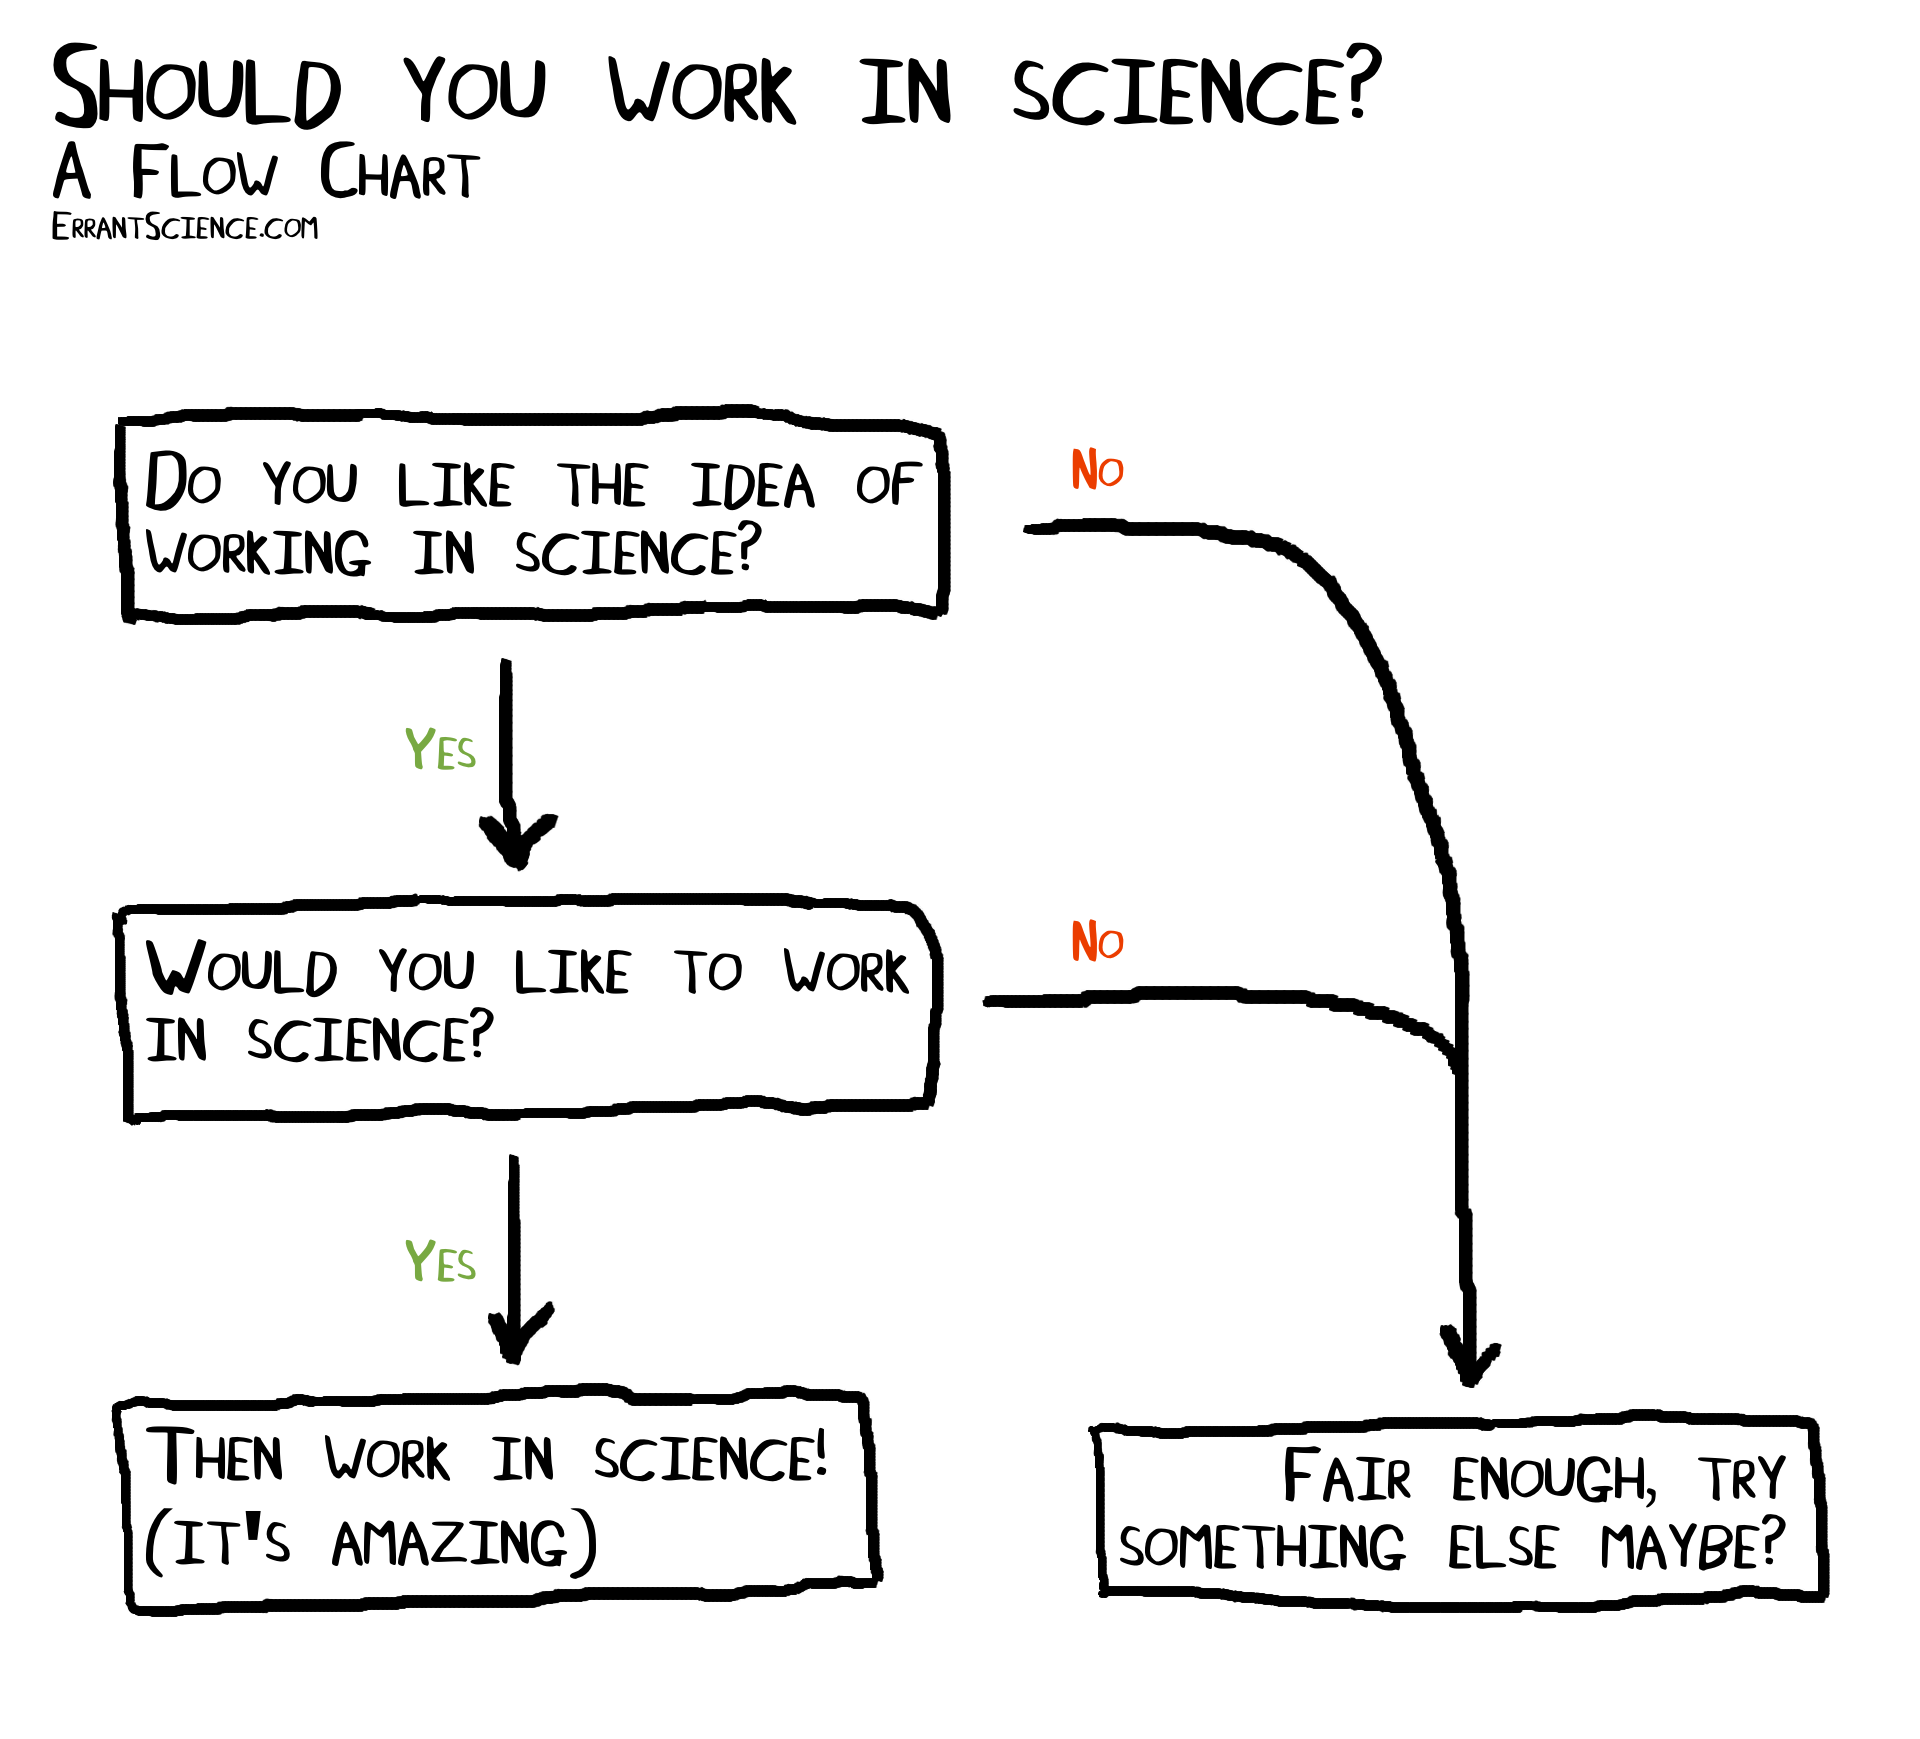 Anyone can work in science – ErrantScience